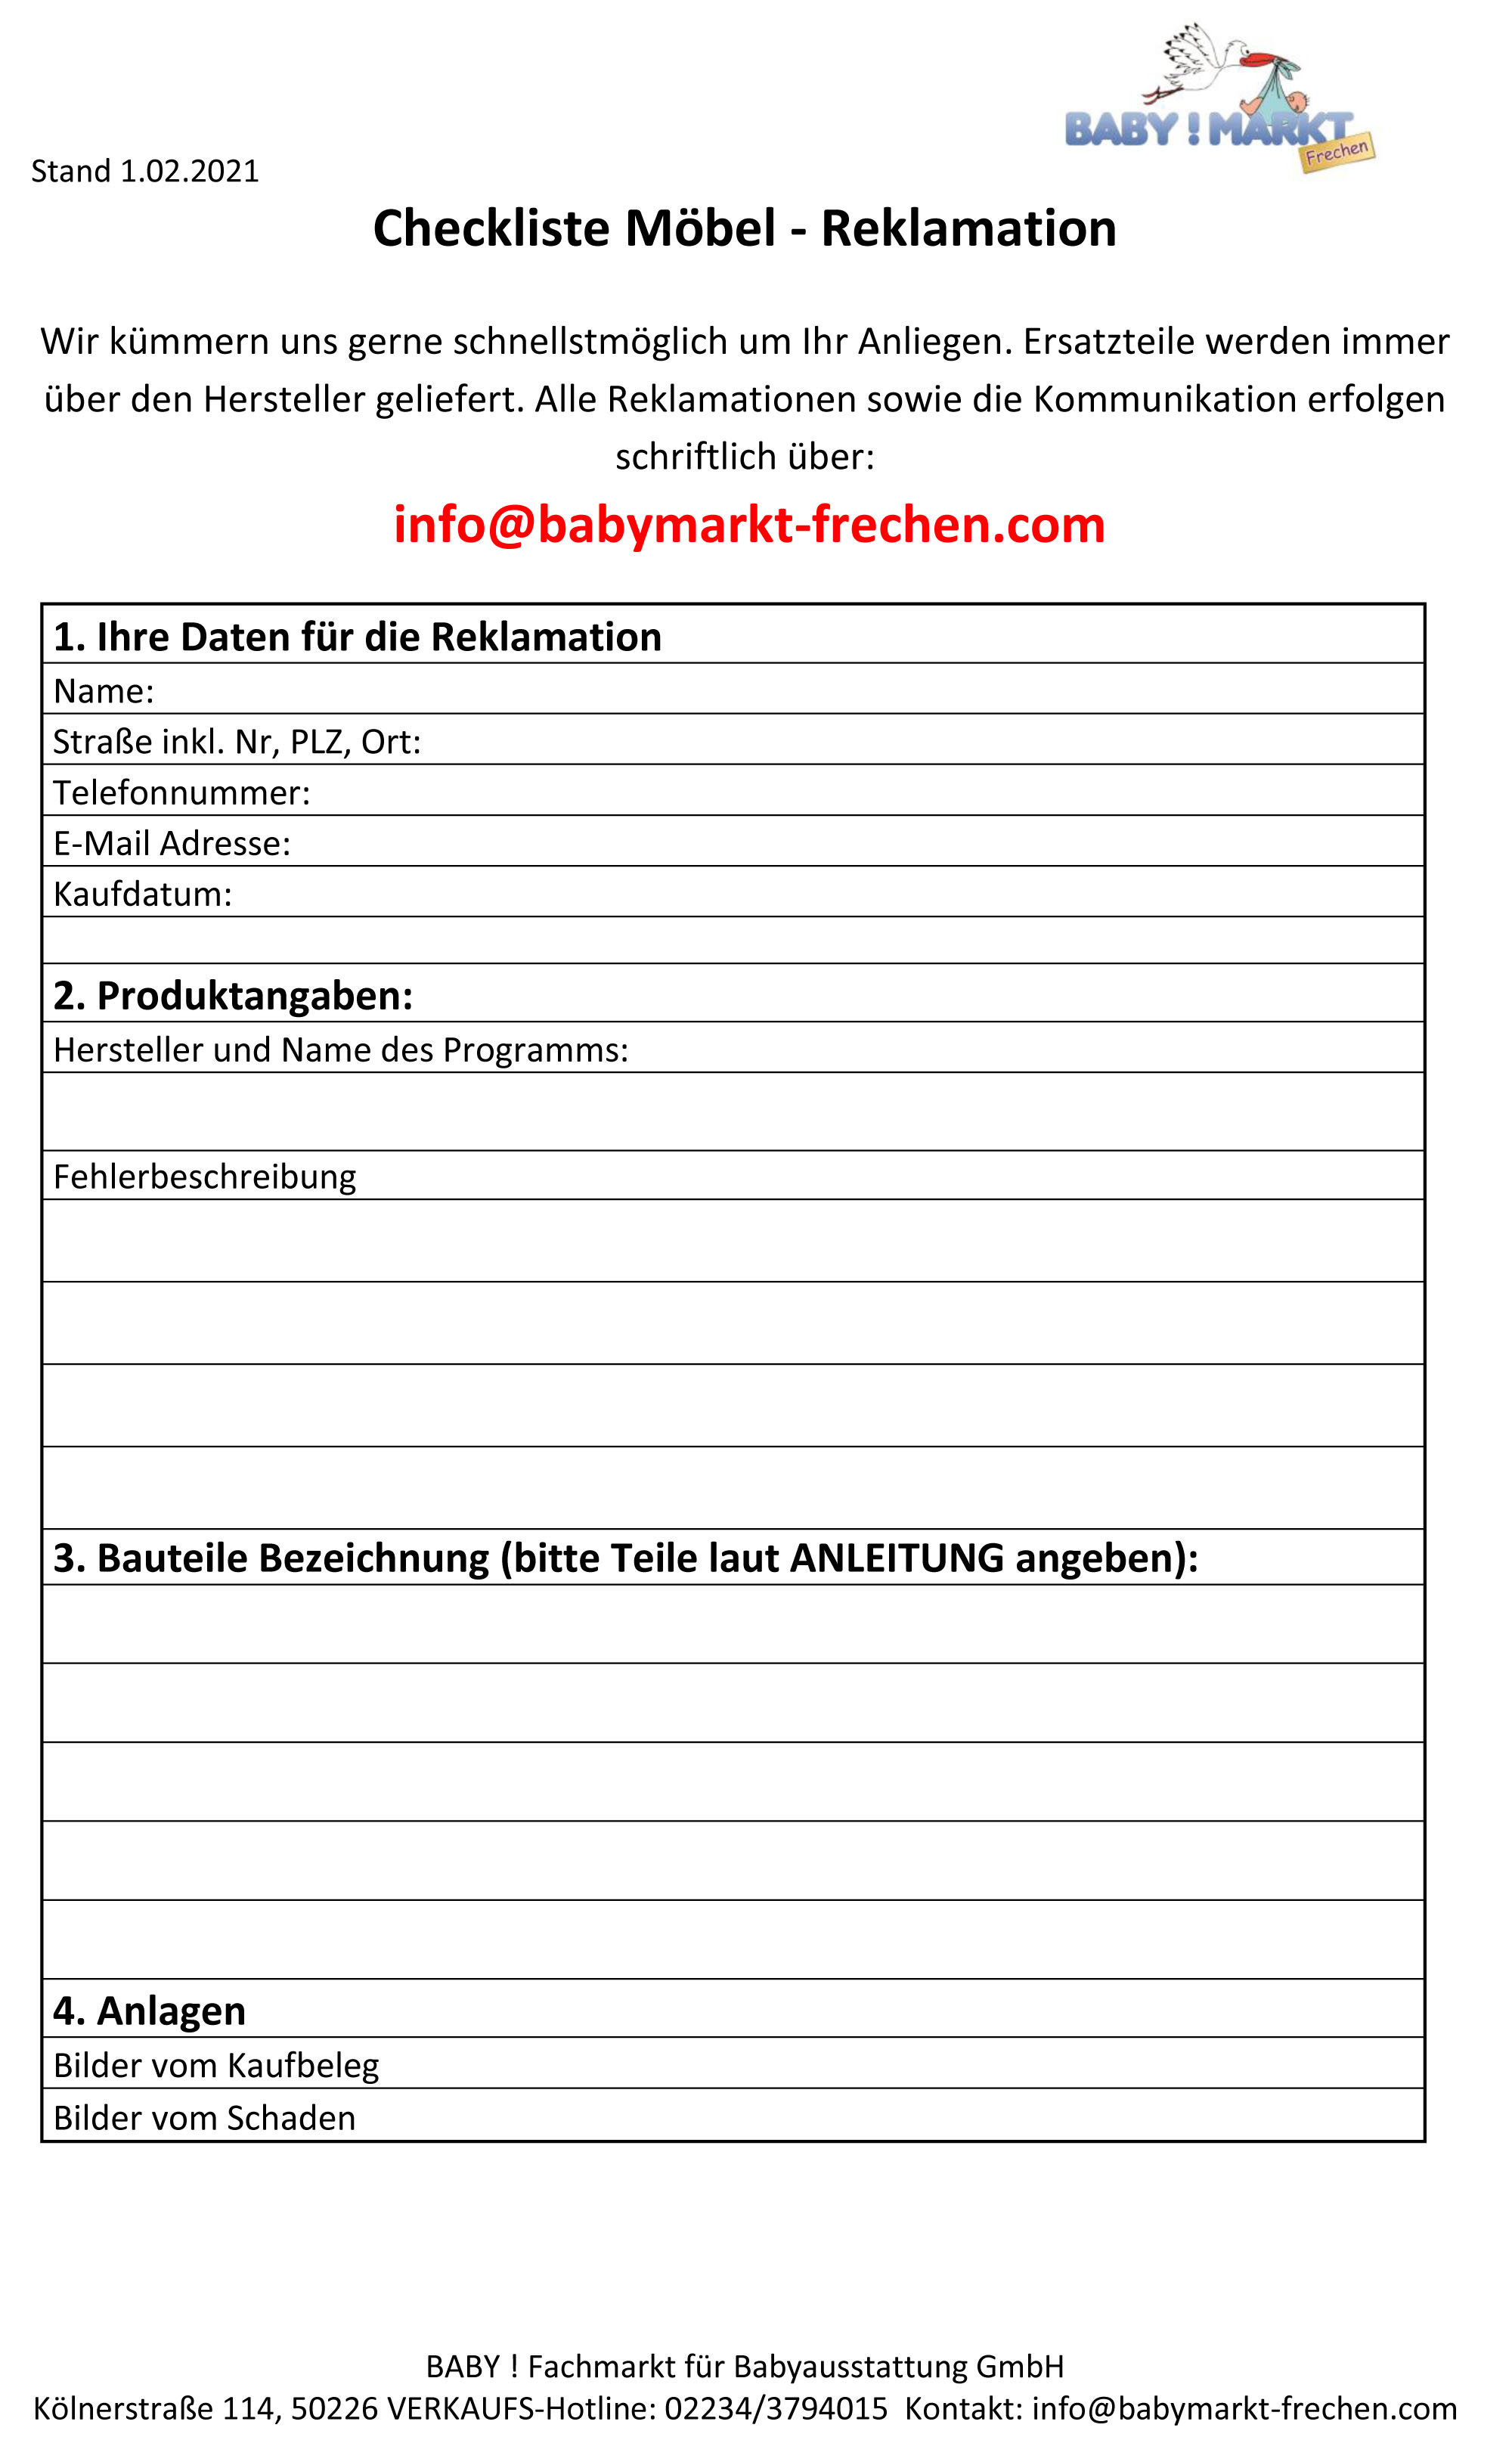 Checkliste-m-bel-Reklamationen602d2a9958163